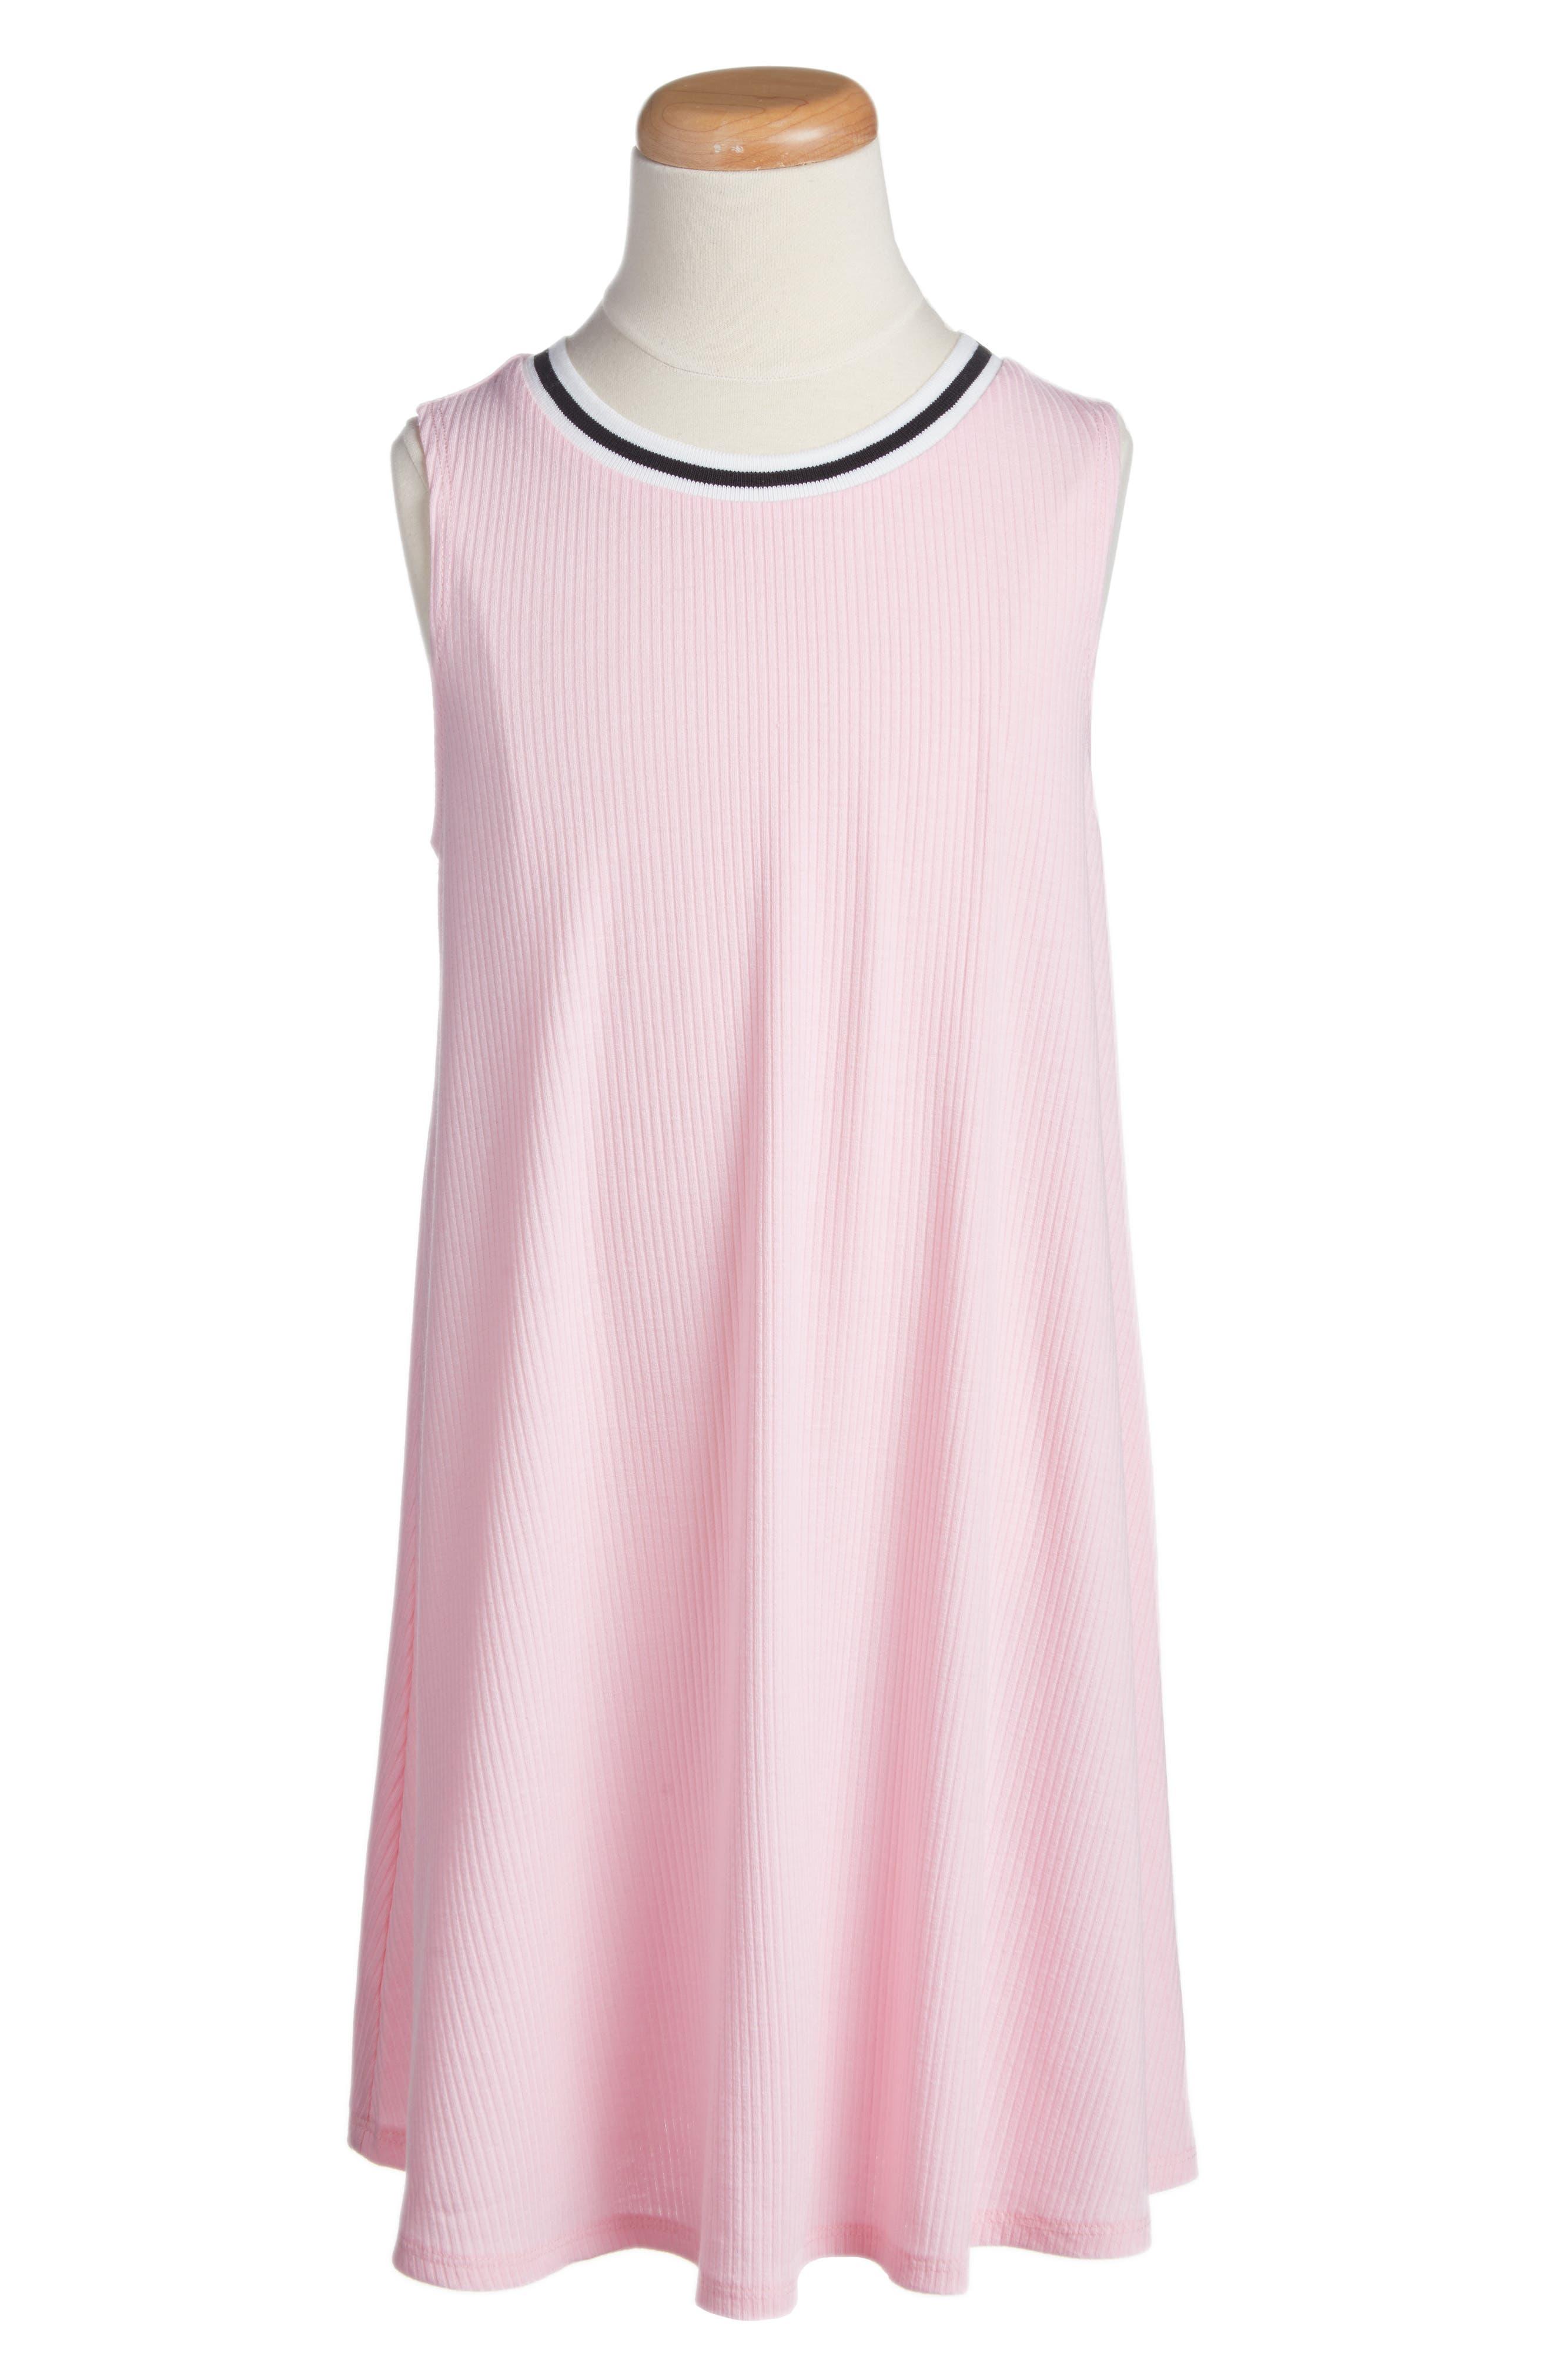 Ringer Tank Dress,                         Main,                         color, Cameo Pink